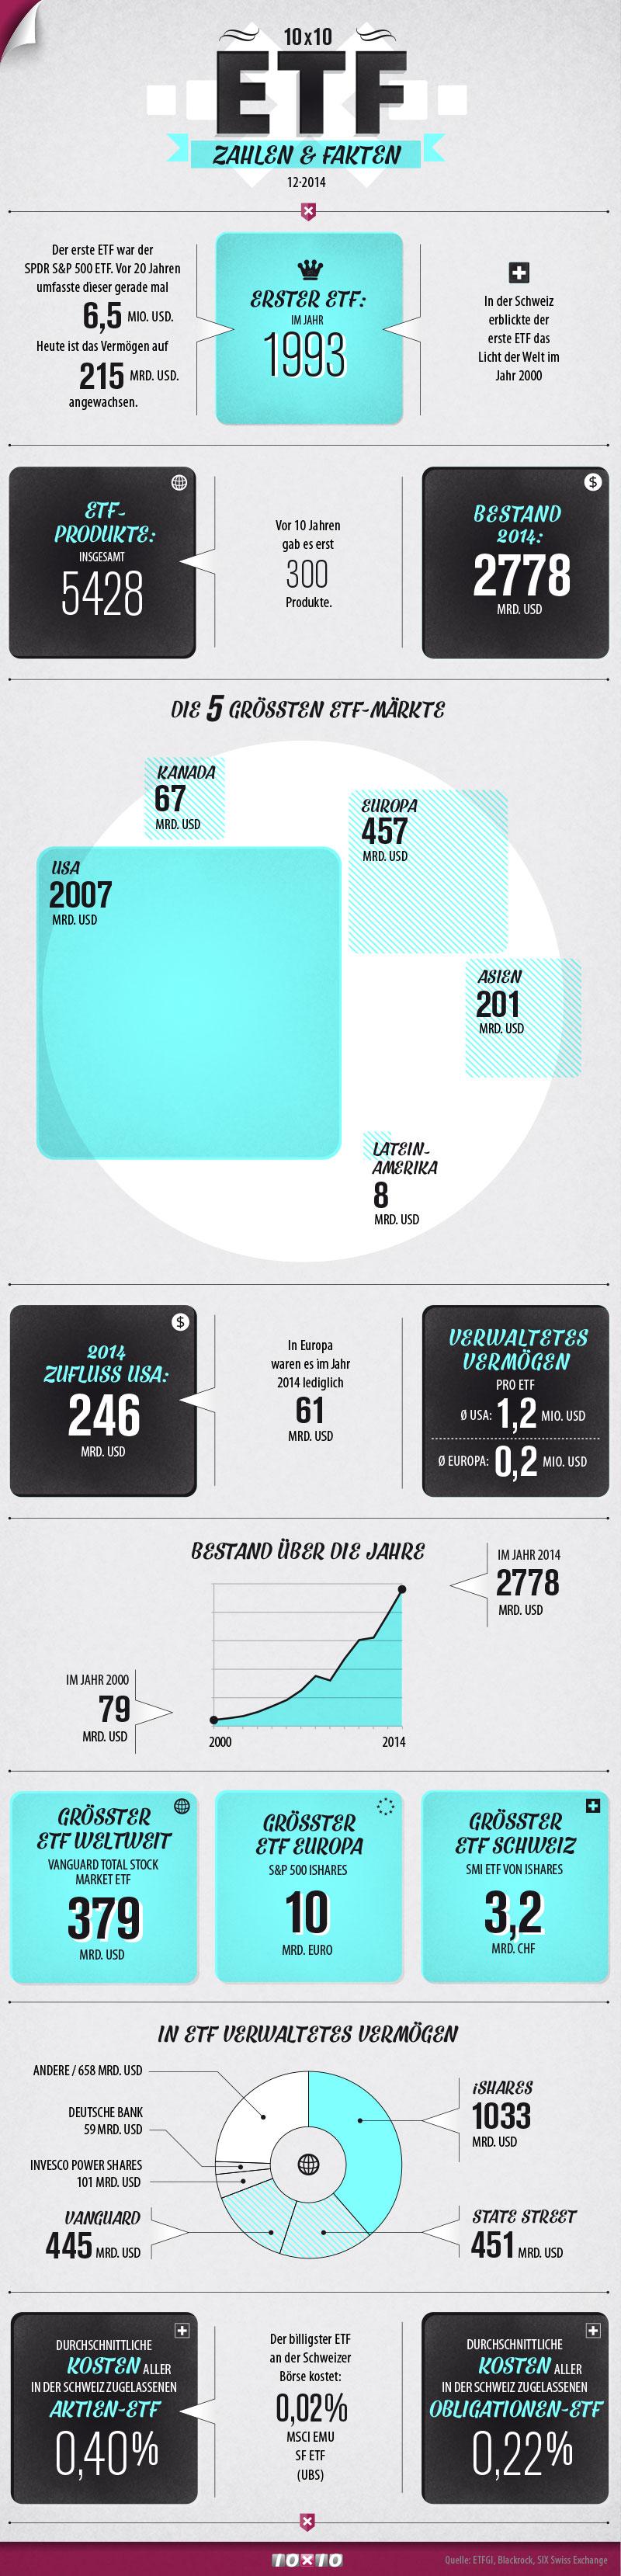 ETF-Infografik-2014-10x10-3